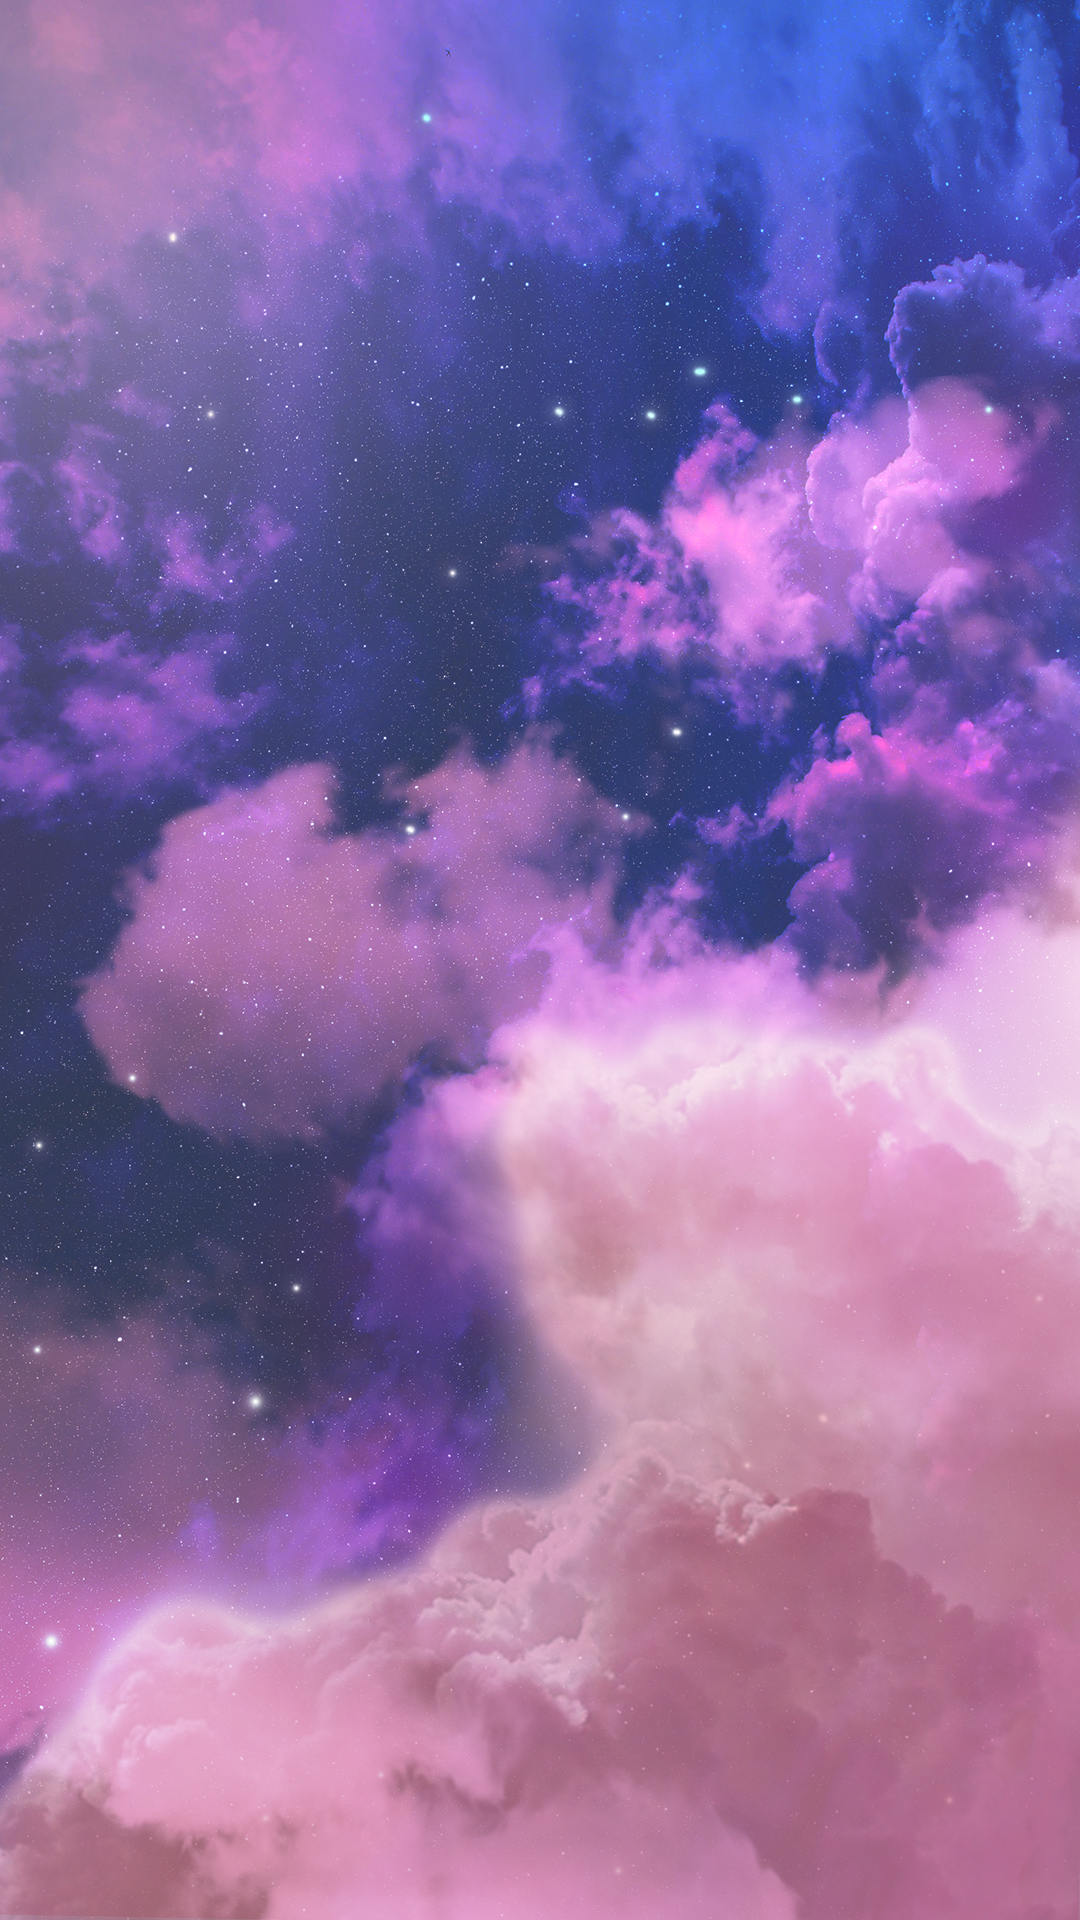 Sky Purple Cloud Violet Pink Atmospheric Phenomenon Galaxy Wallpaper Mor Bulutlar